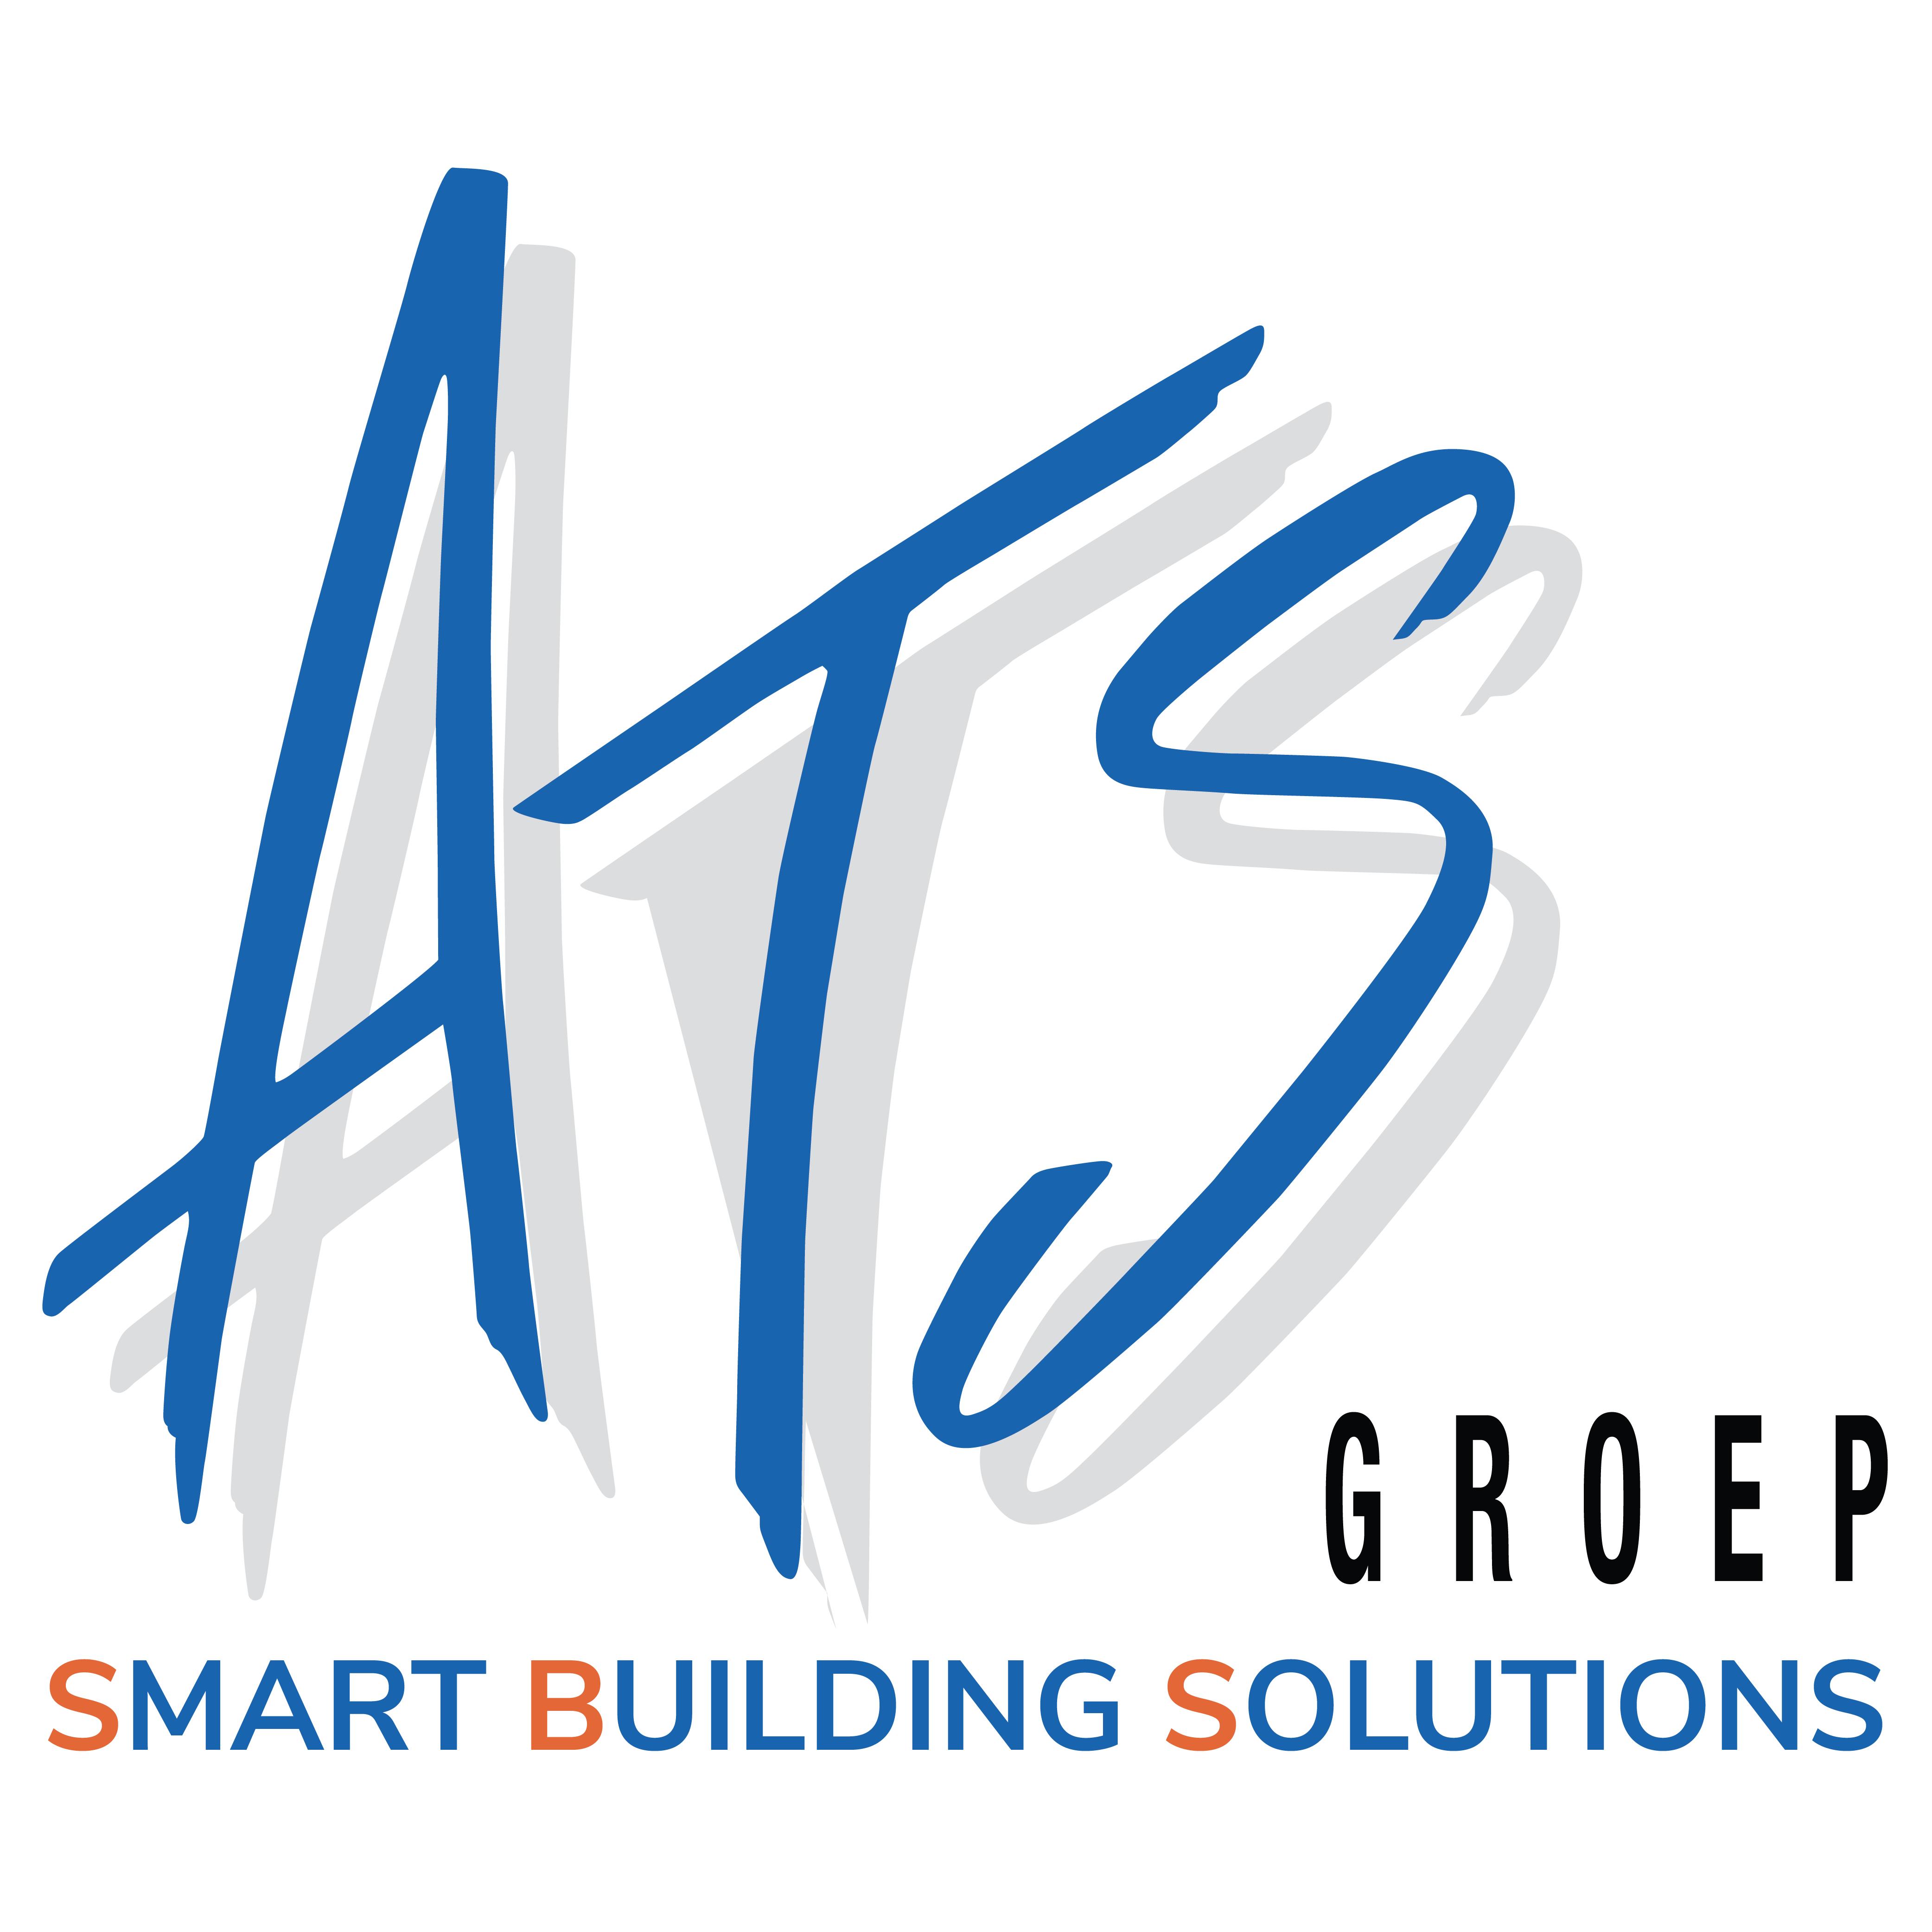 Ats-Smart-Building-Solutions